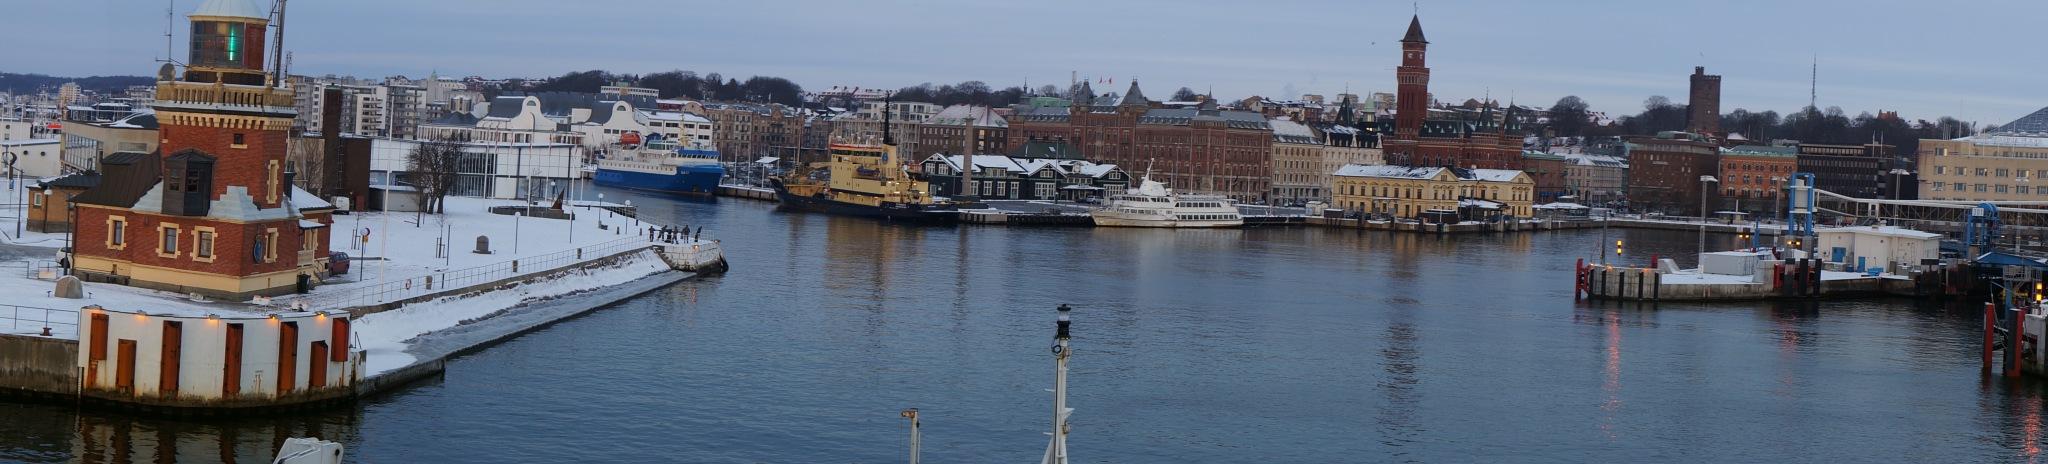 my hometown Helsingborg by Max Cesare Parodi